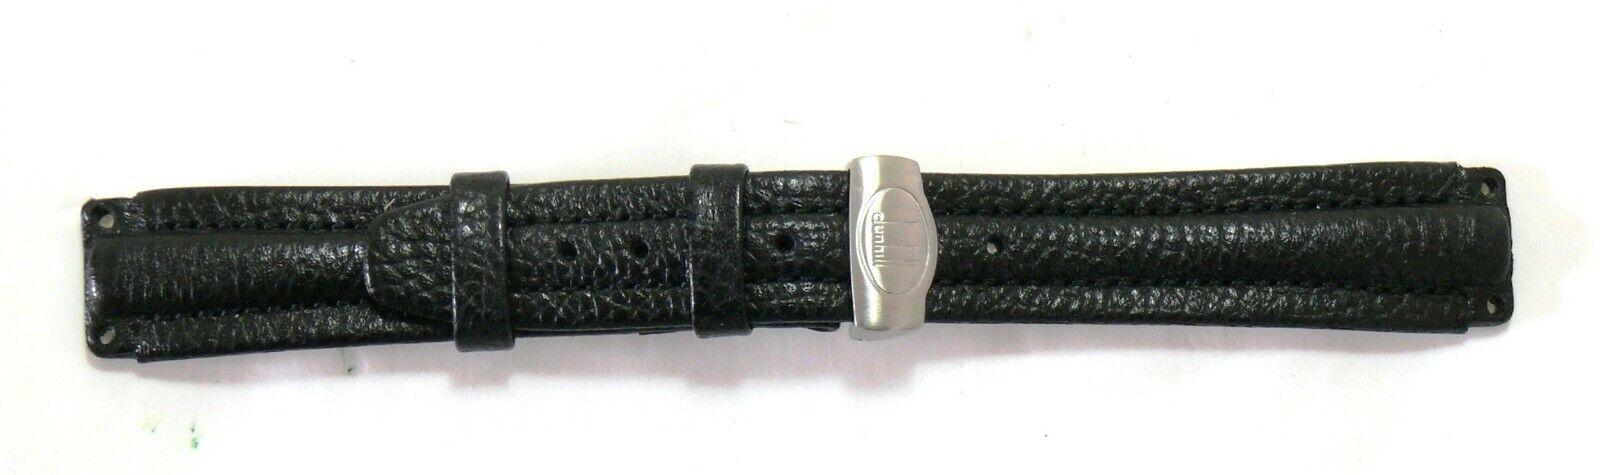 Genuine Alfred Dunhill Lederband mit Faltschliesse 4000AL NEU #33292-3